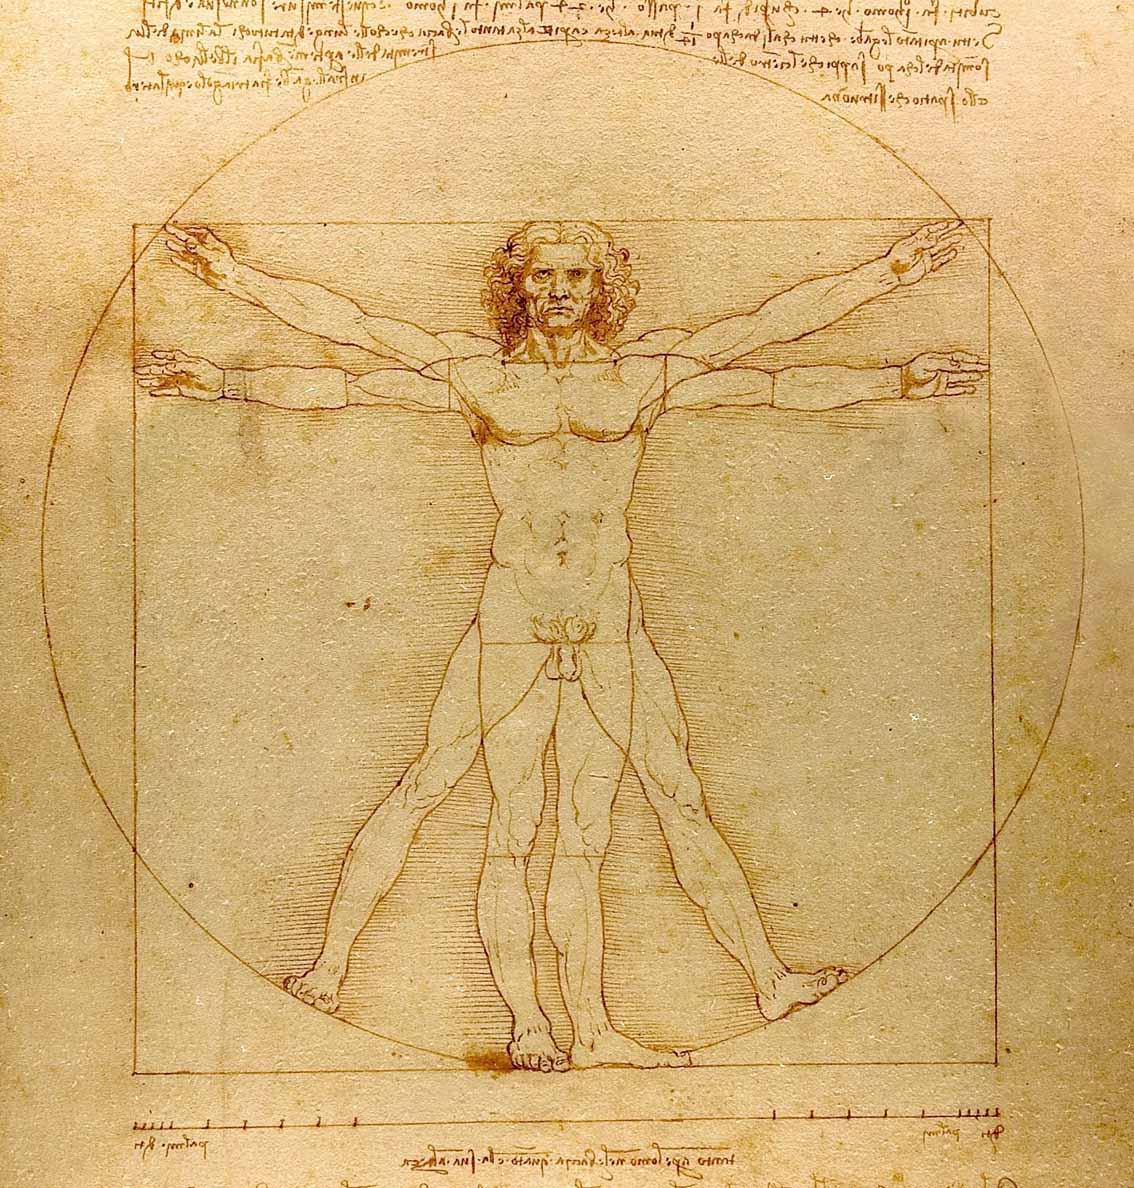 Leonardo da Vinci: el genio, el hombre Artes & contextos Da Vinci Vitruve Luc Viatour